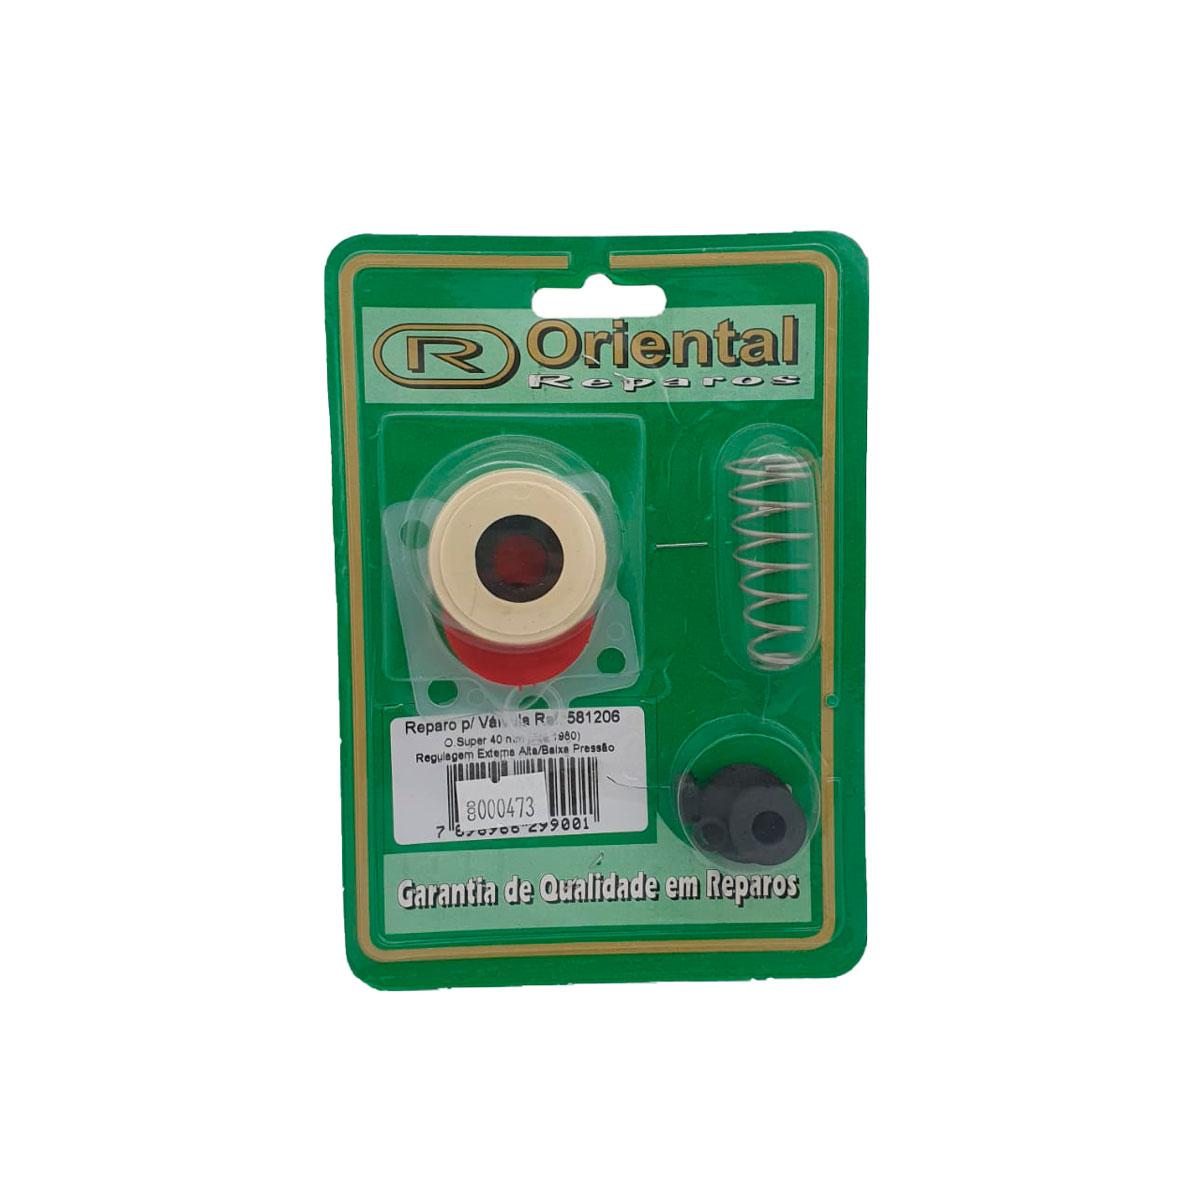 Reparo Válvula Oriente Super 40mm C/ Regulador